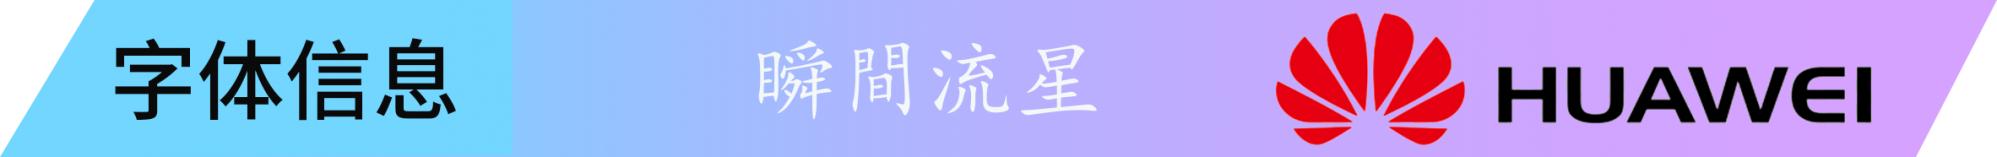 字体信息.png